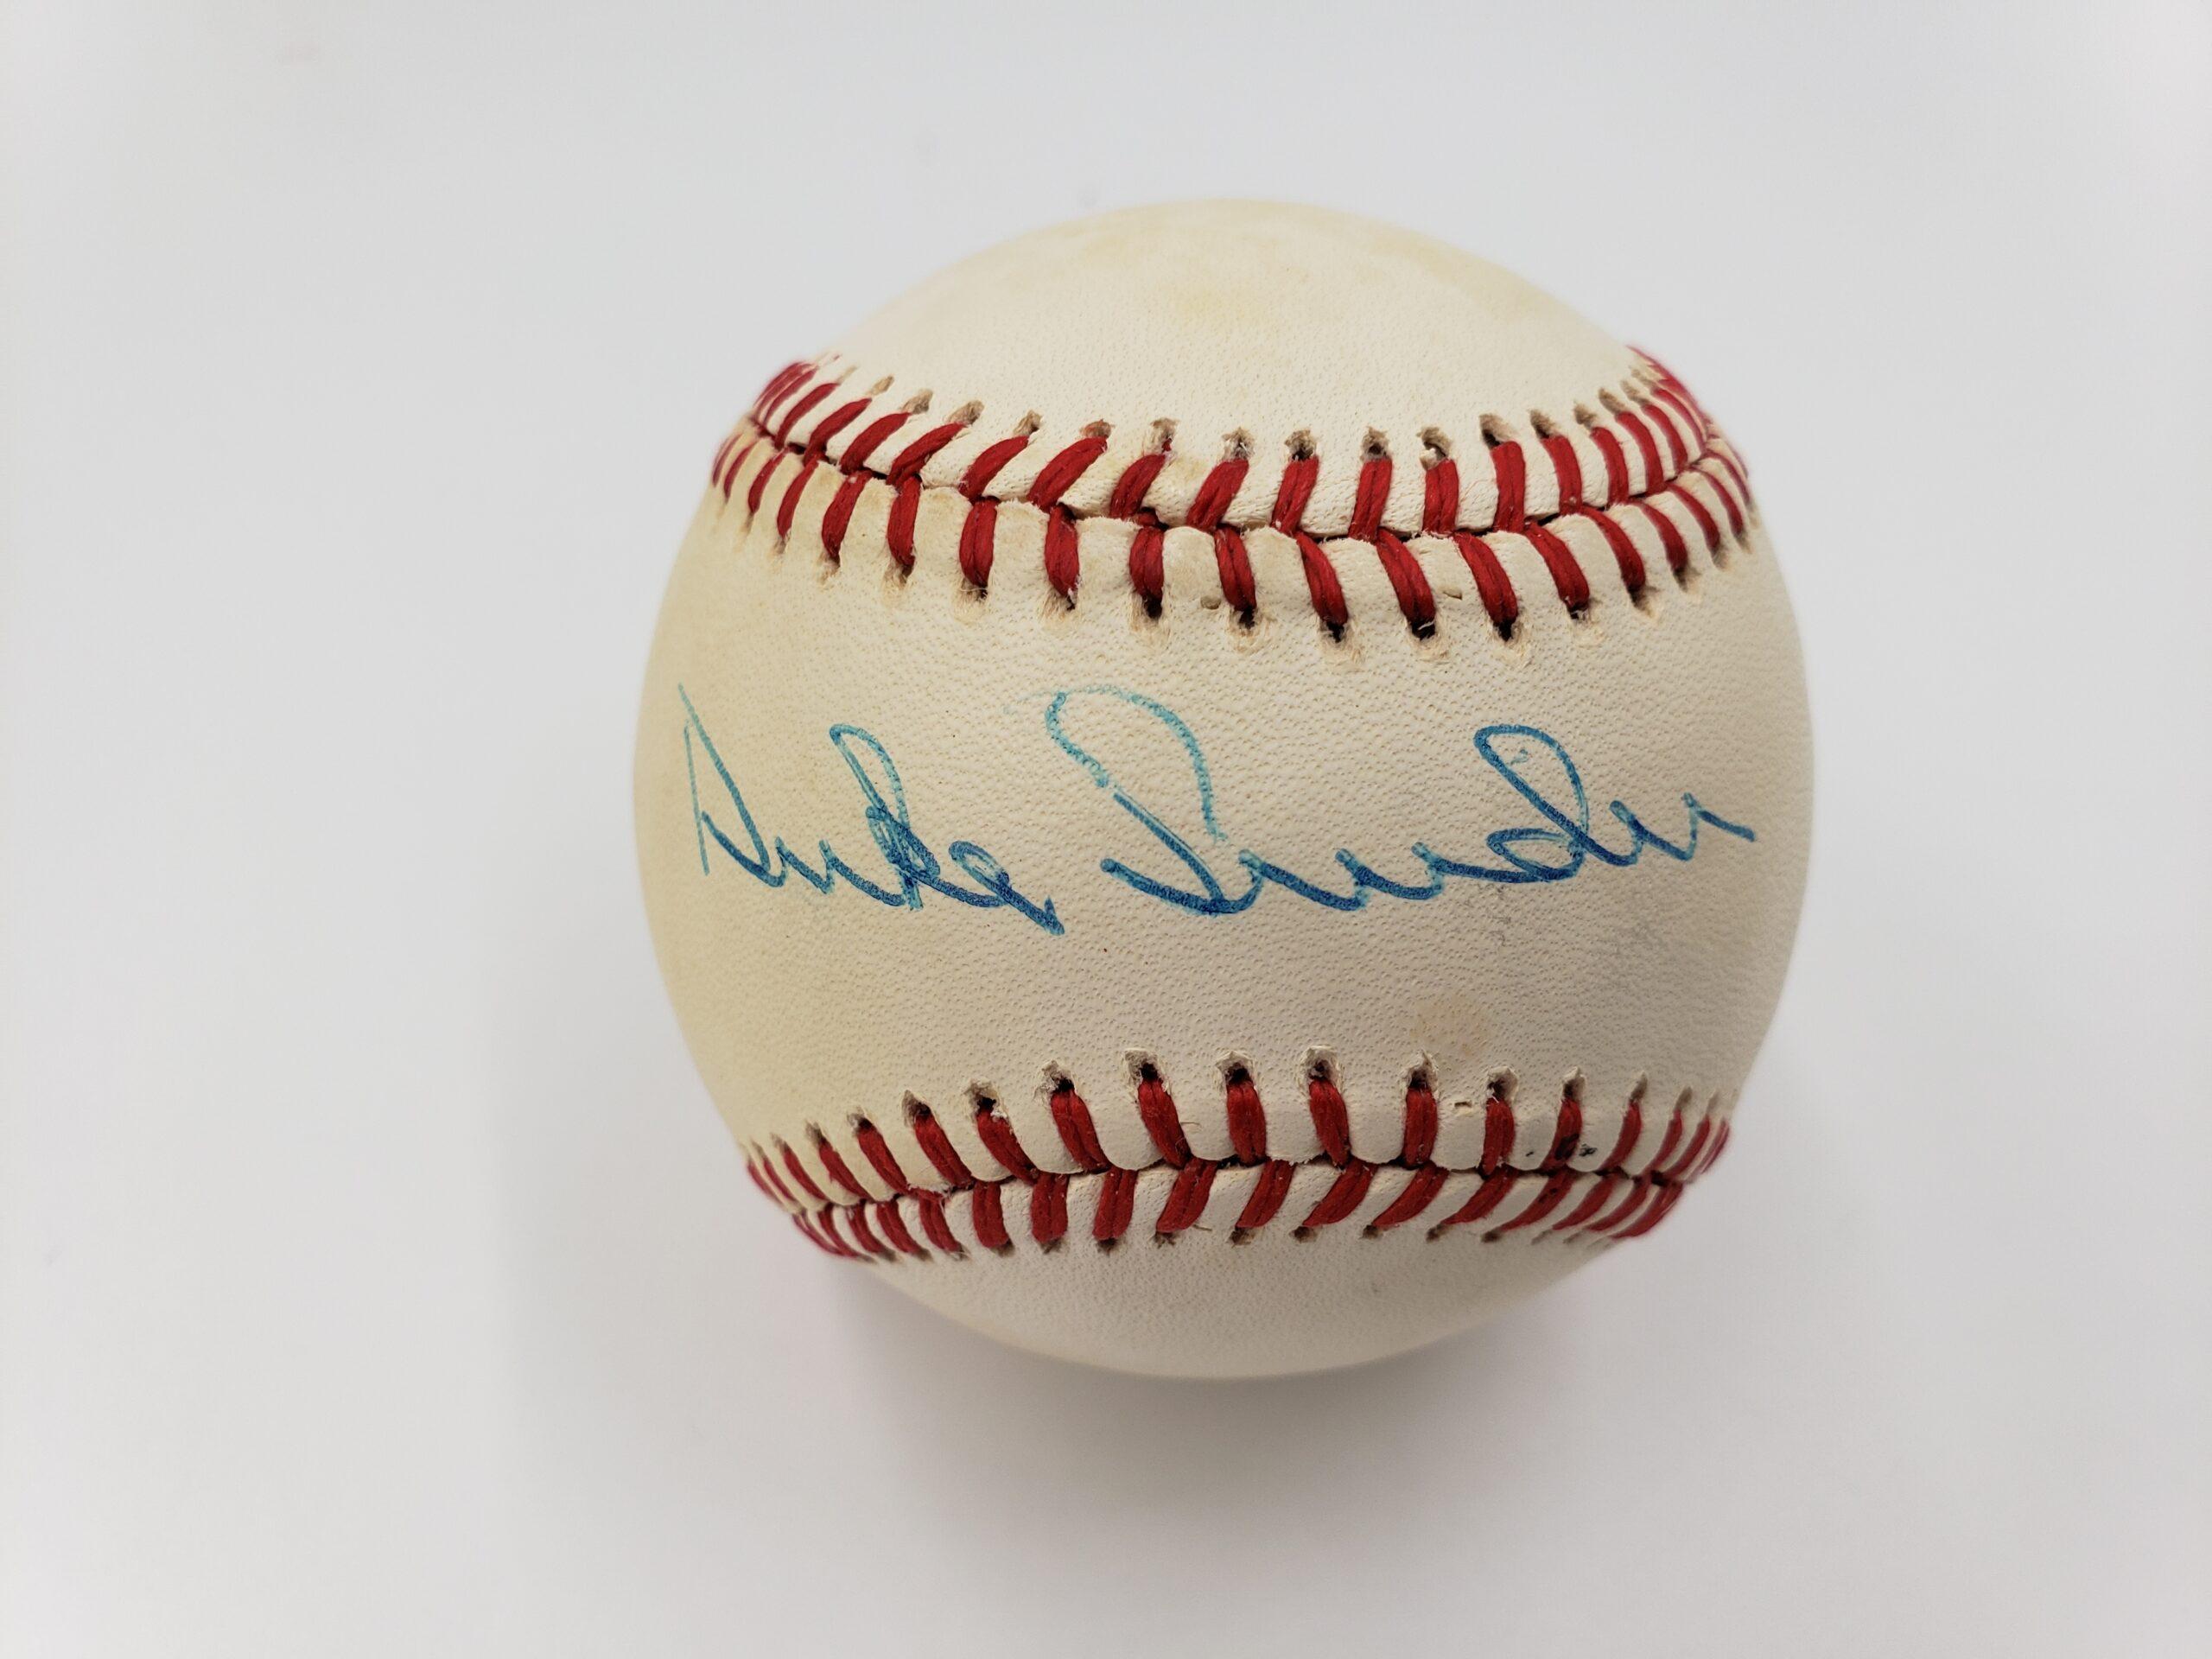 Duke Snyder Autographed Baseball